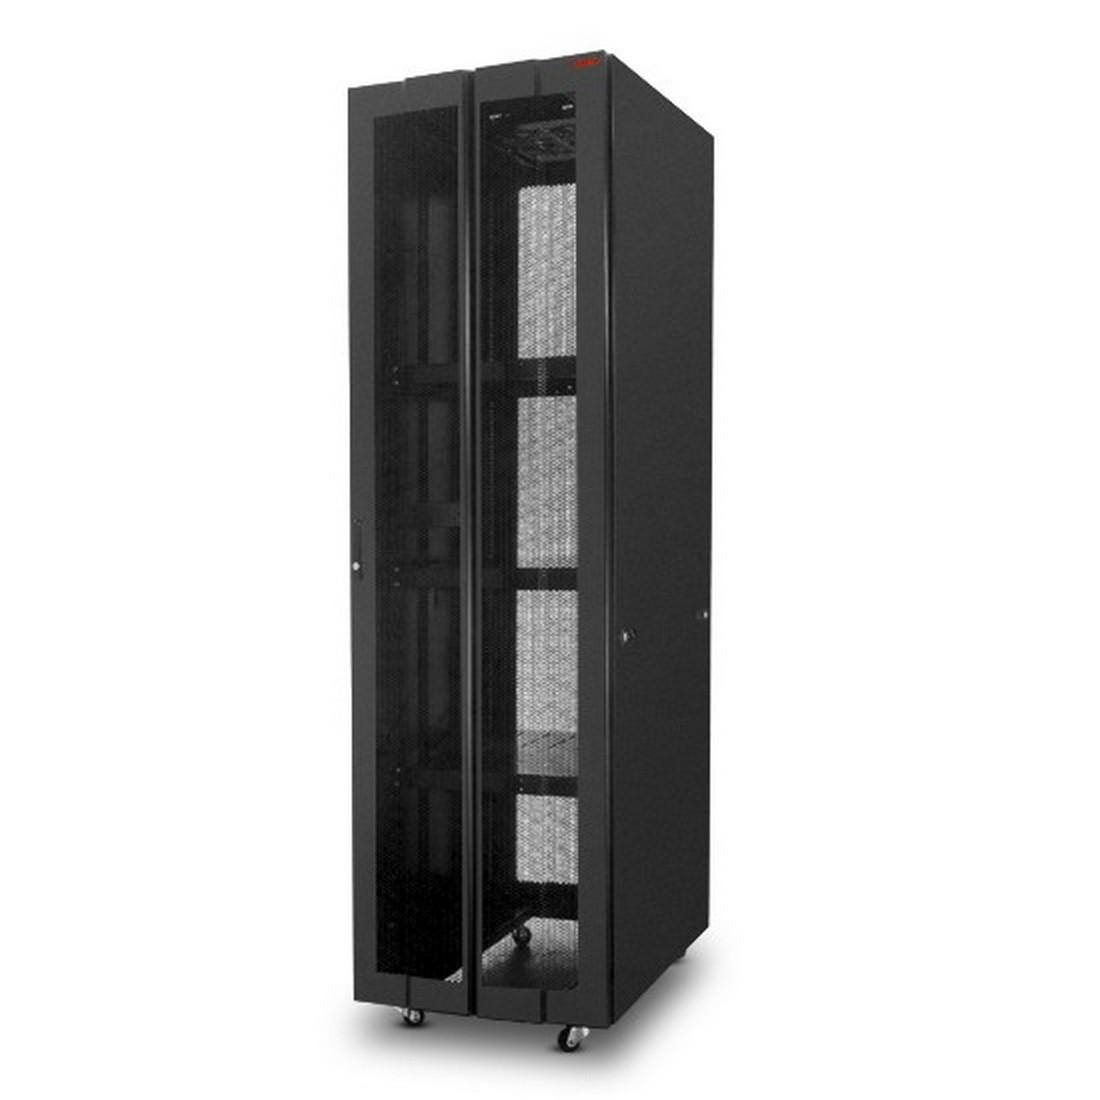 Шкаф серверный SHIP 601.6842.65.100